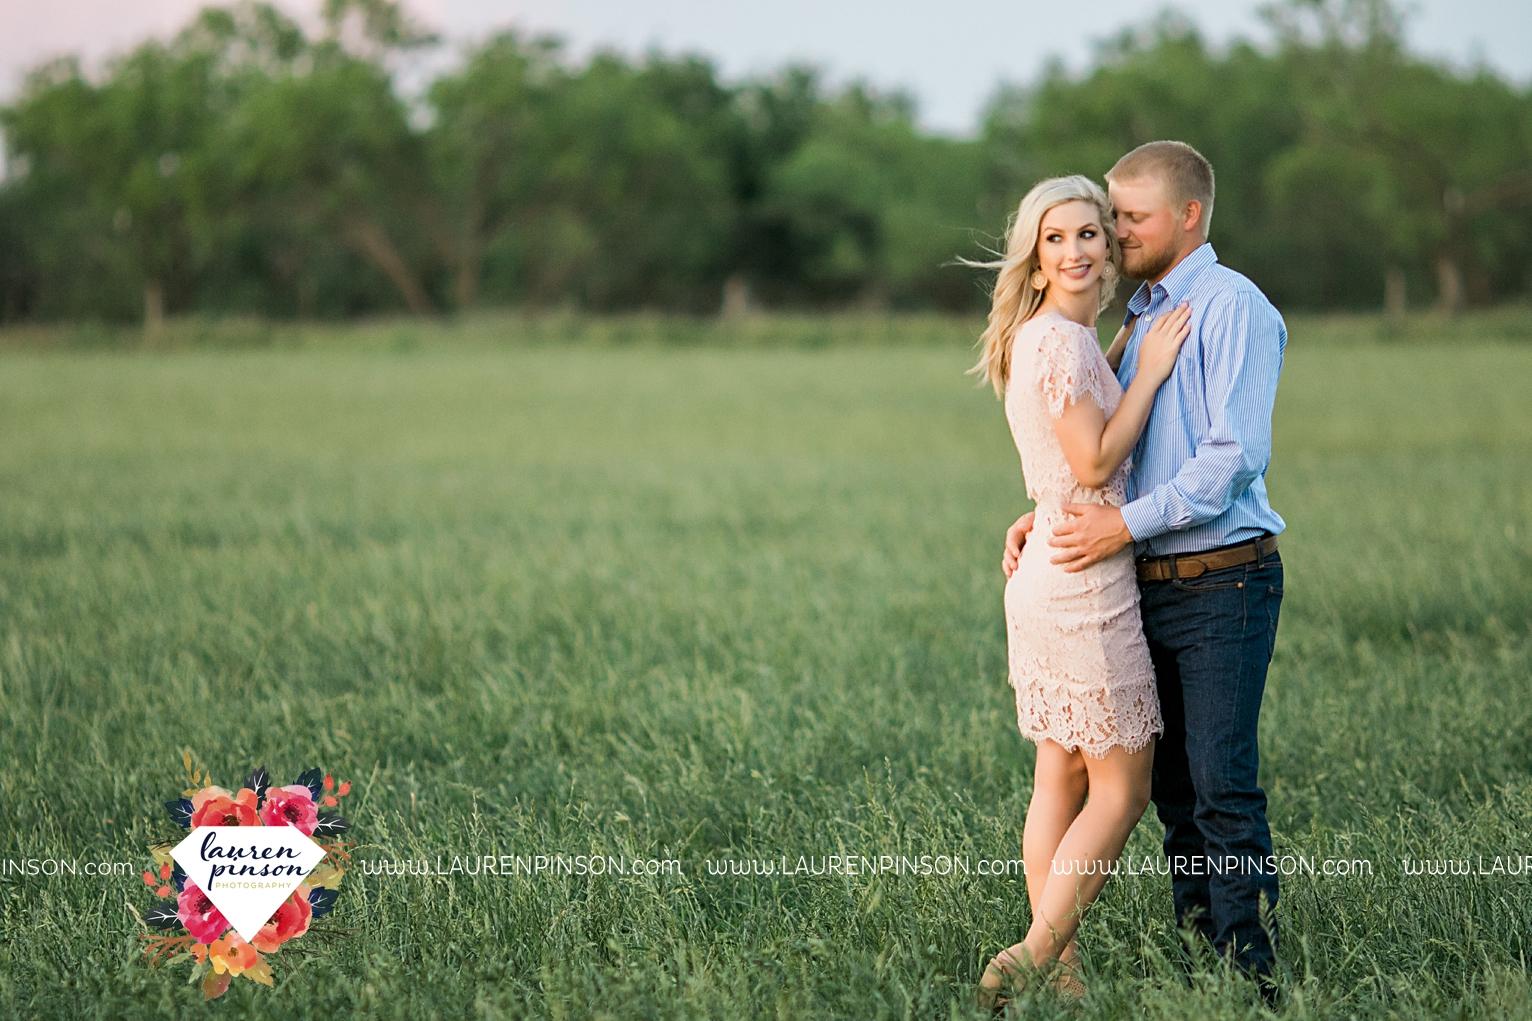 wichita-falls-texas-wedding-photographer-scotland-texas-engagement-session-country-barn-field-windthorst_2775.jpg